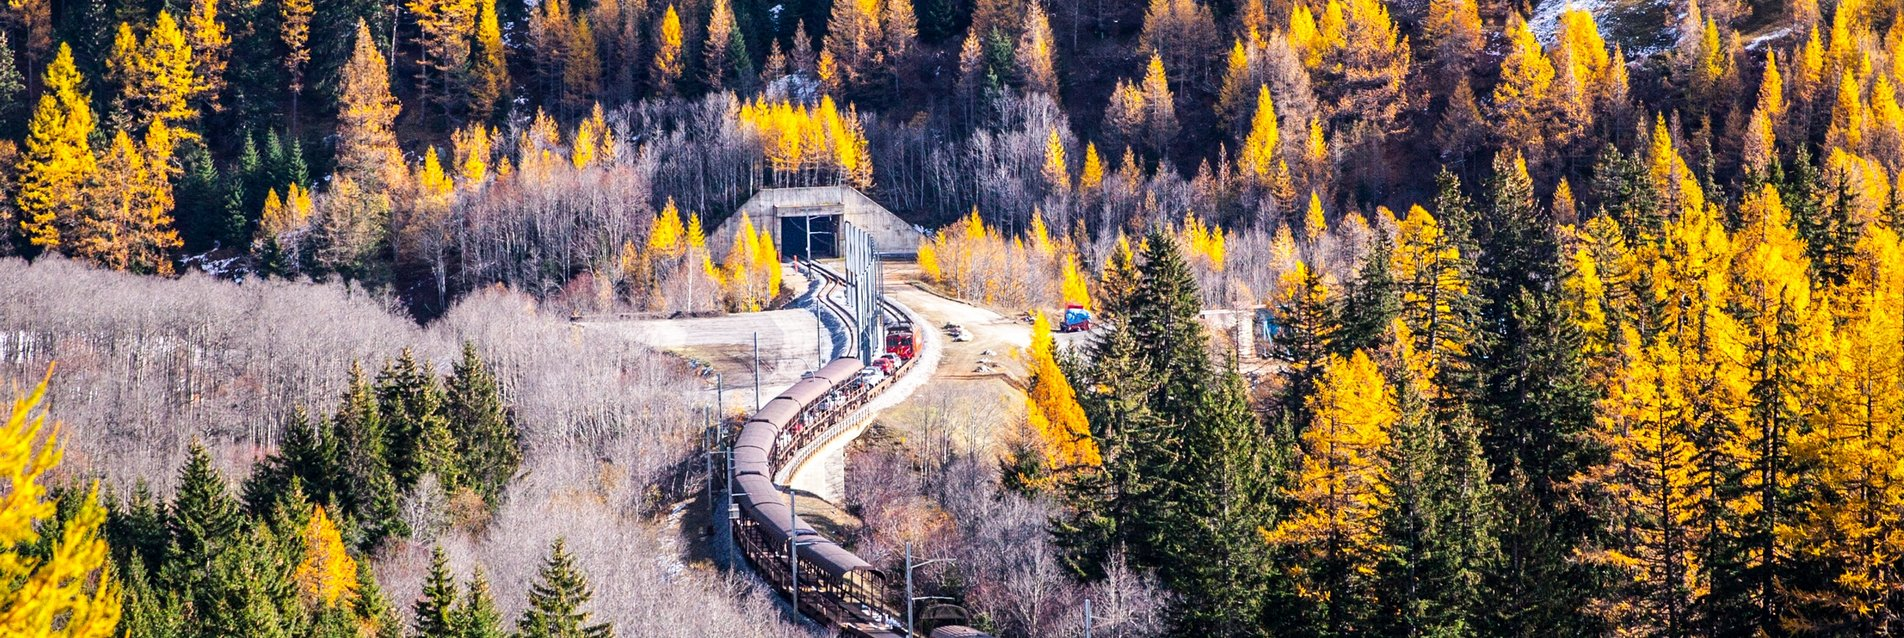 Autozug vor dem Furkatunnelportal im Herbst